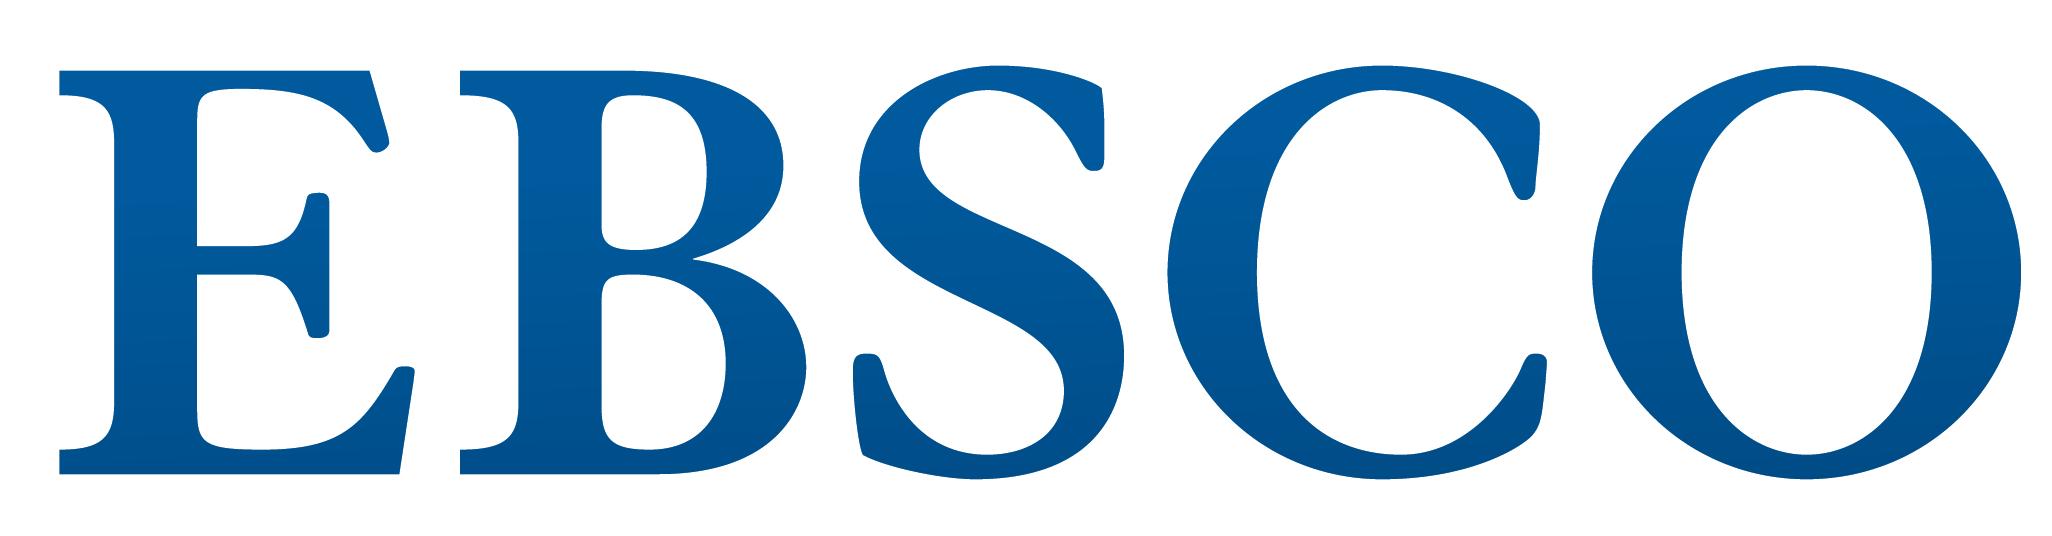 ebsco_logo